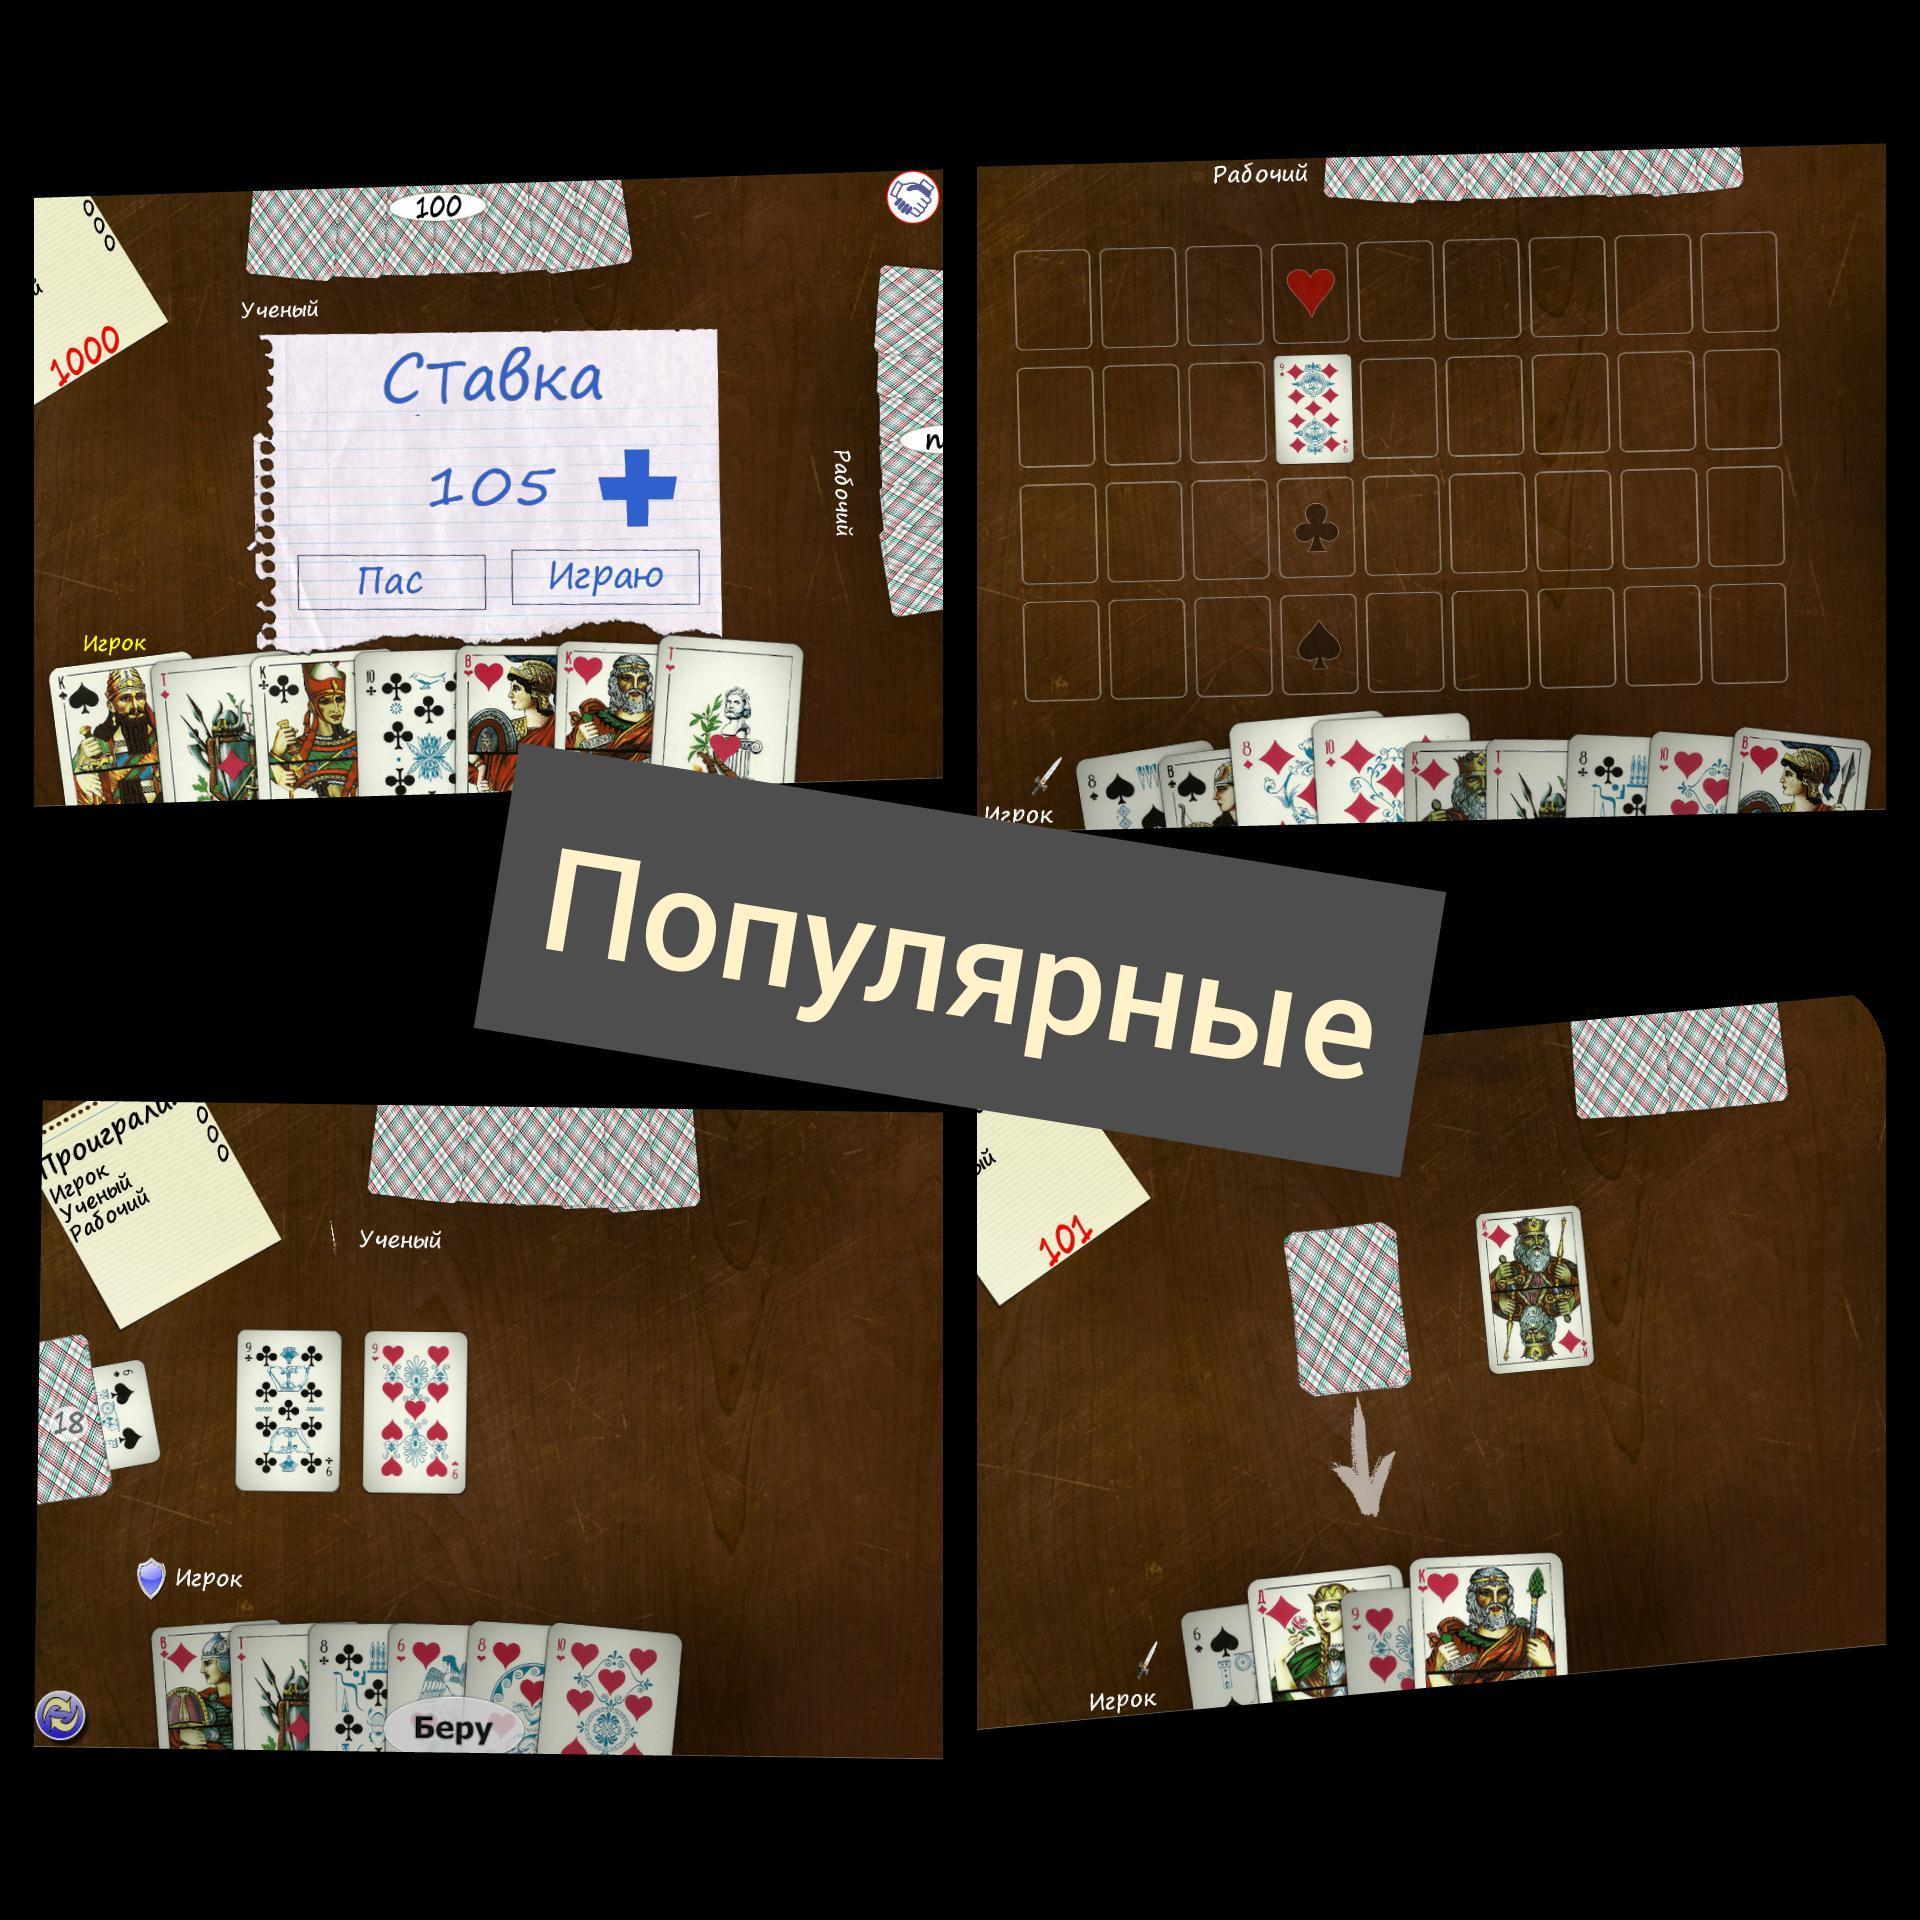 Гранд казино белград